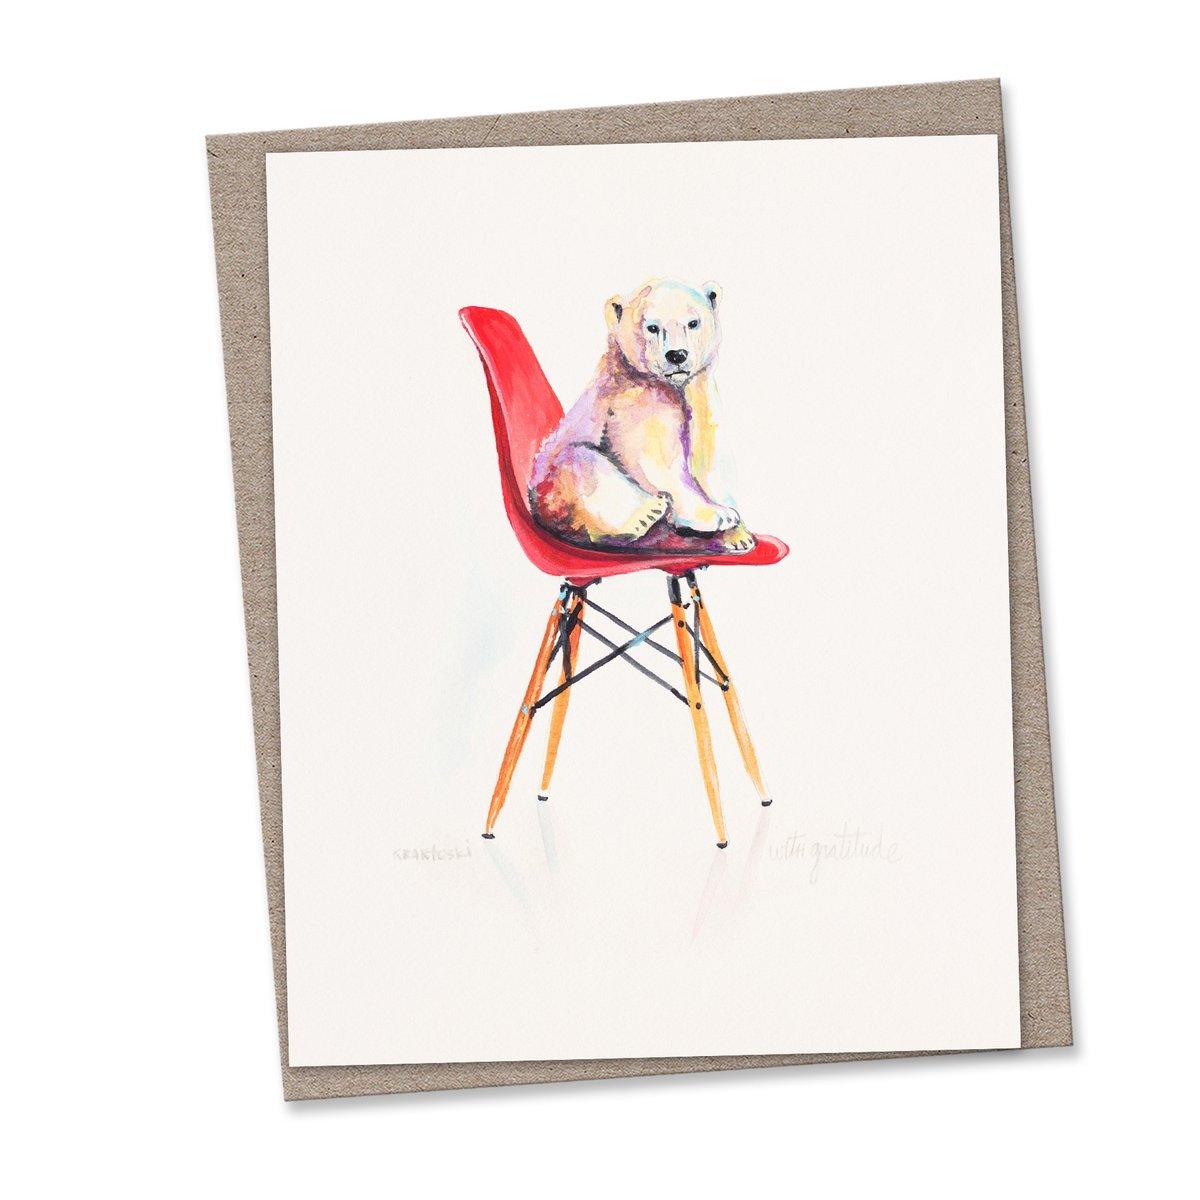 Image of POLAR BEARS + CHAIRS prints